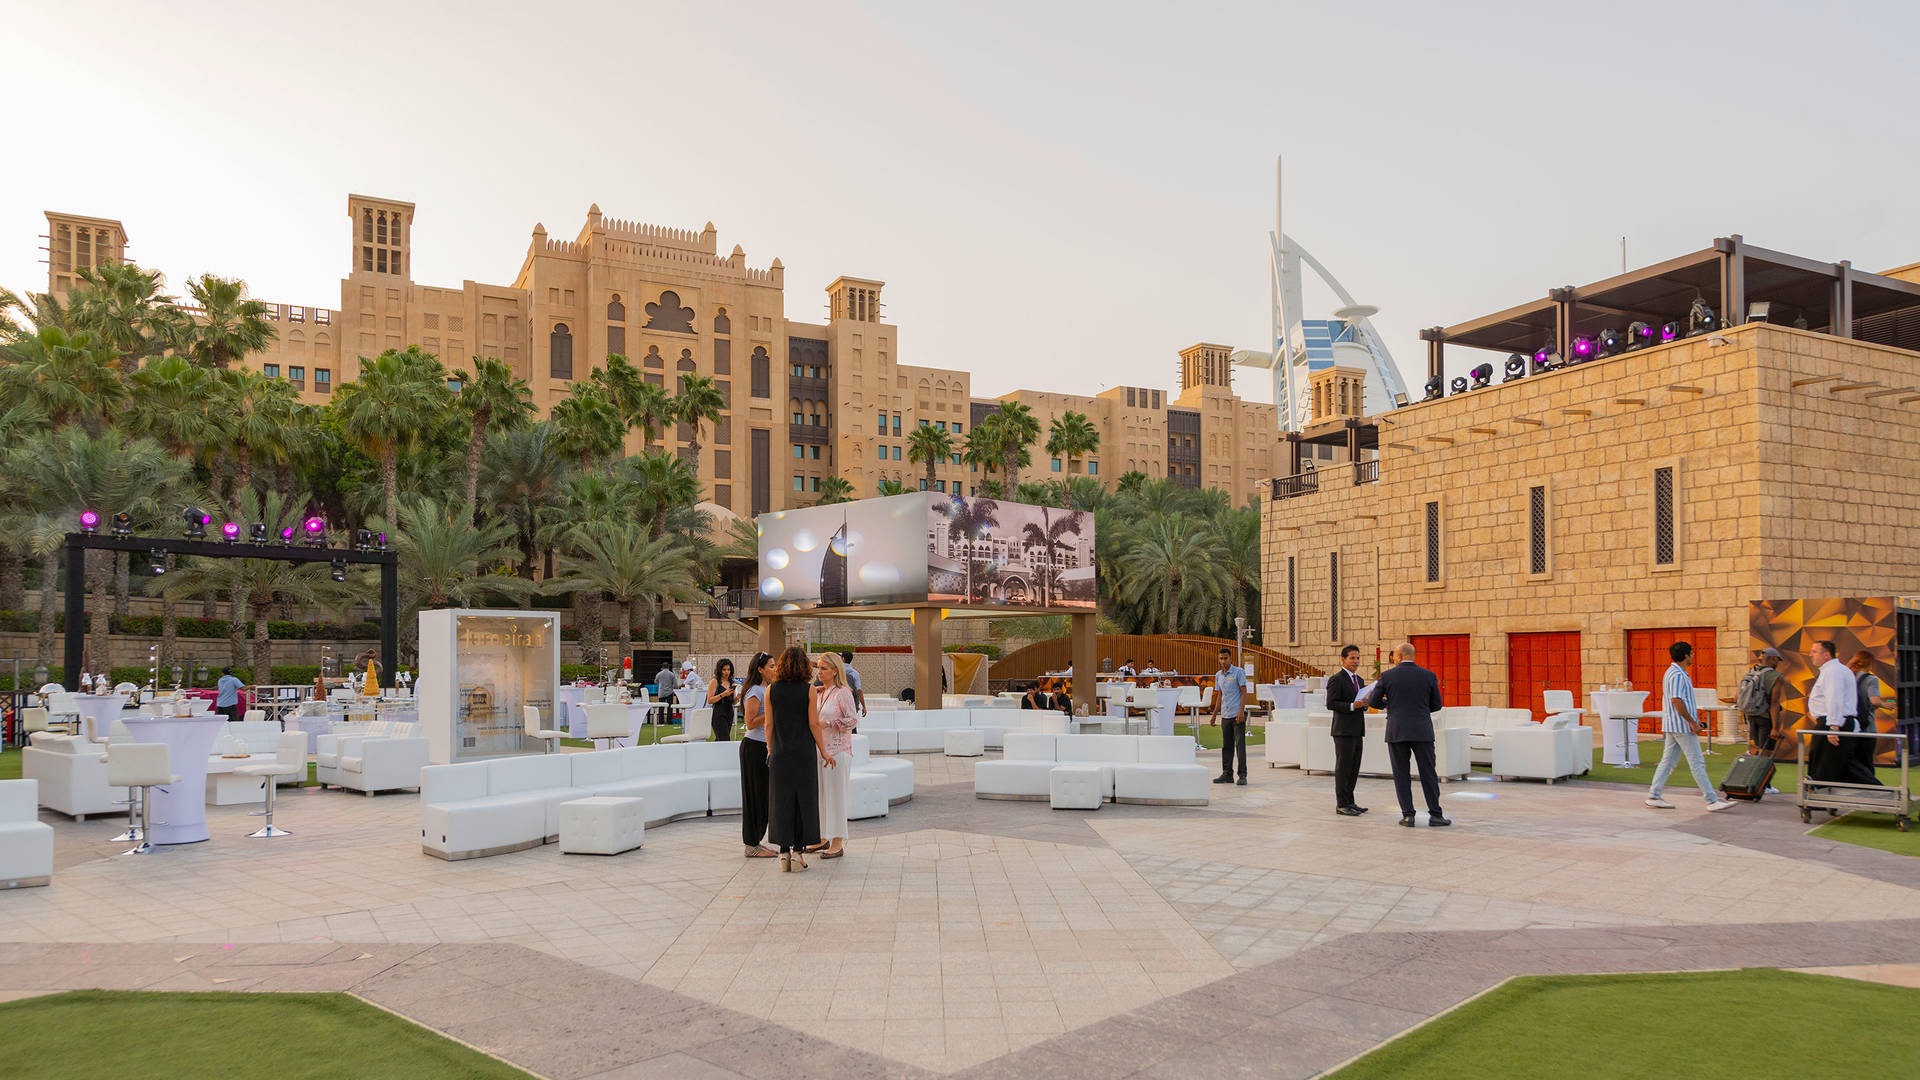 https://cdn.jumeirah.com/-/mediadh/DH/Hospitality/Jumeirah/Occasion/Dubai/Burj-Al-Arab/Al-Naseem-Al-Qasr-Dar-Al-Masyaf-A-Salam/Venues/Fort-Island/Fort-Island-Madinat-Jumeirah-Event-11_16-9.jpg?h=1080&w=1920&hash=E373C5B7BD877A7EF2A7E89838D3AF46